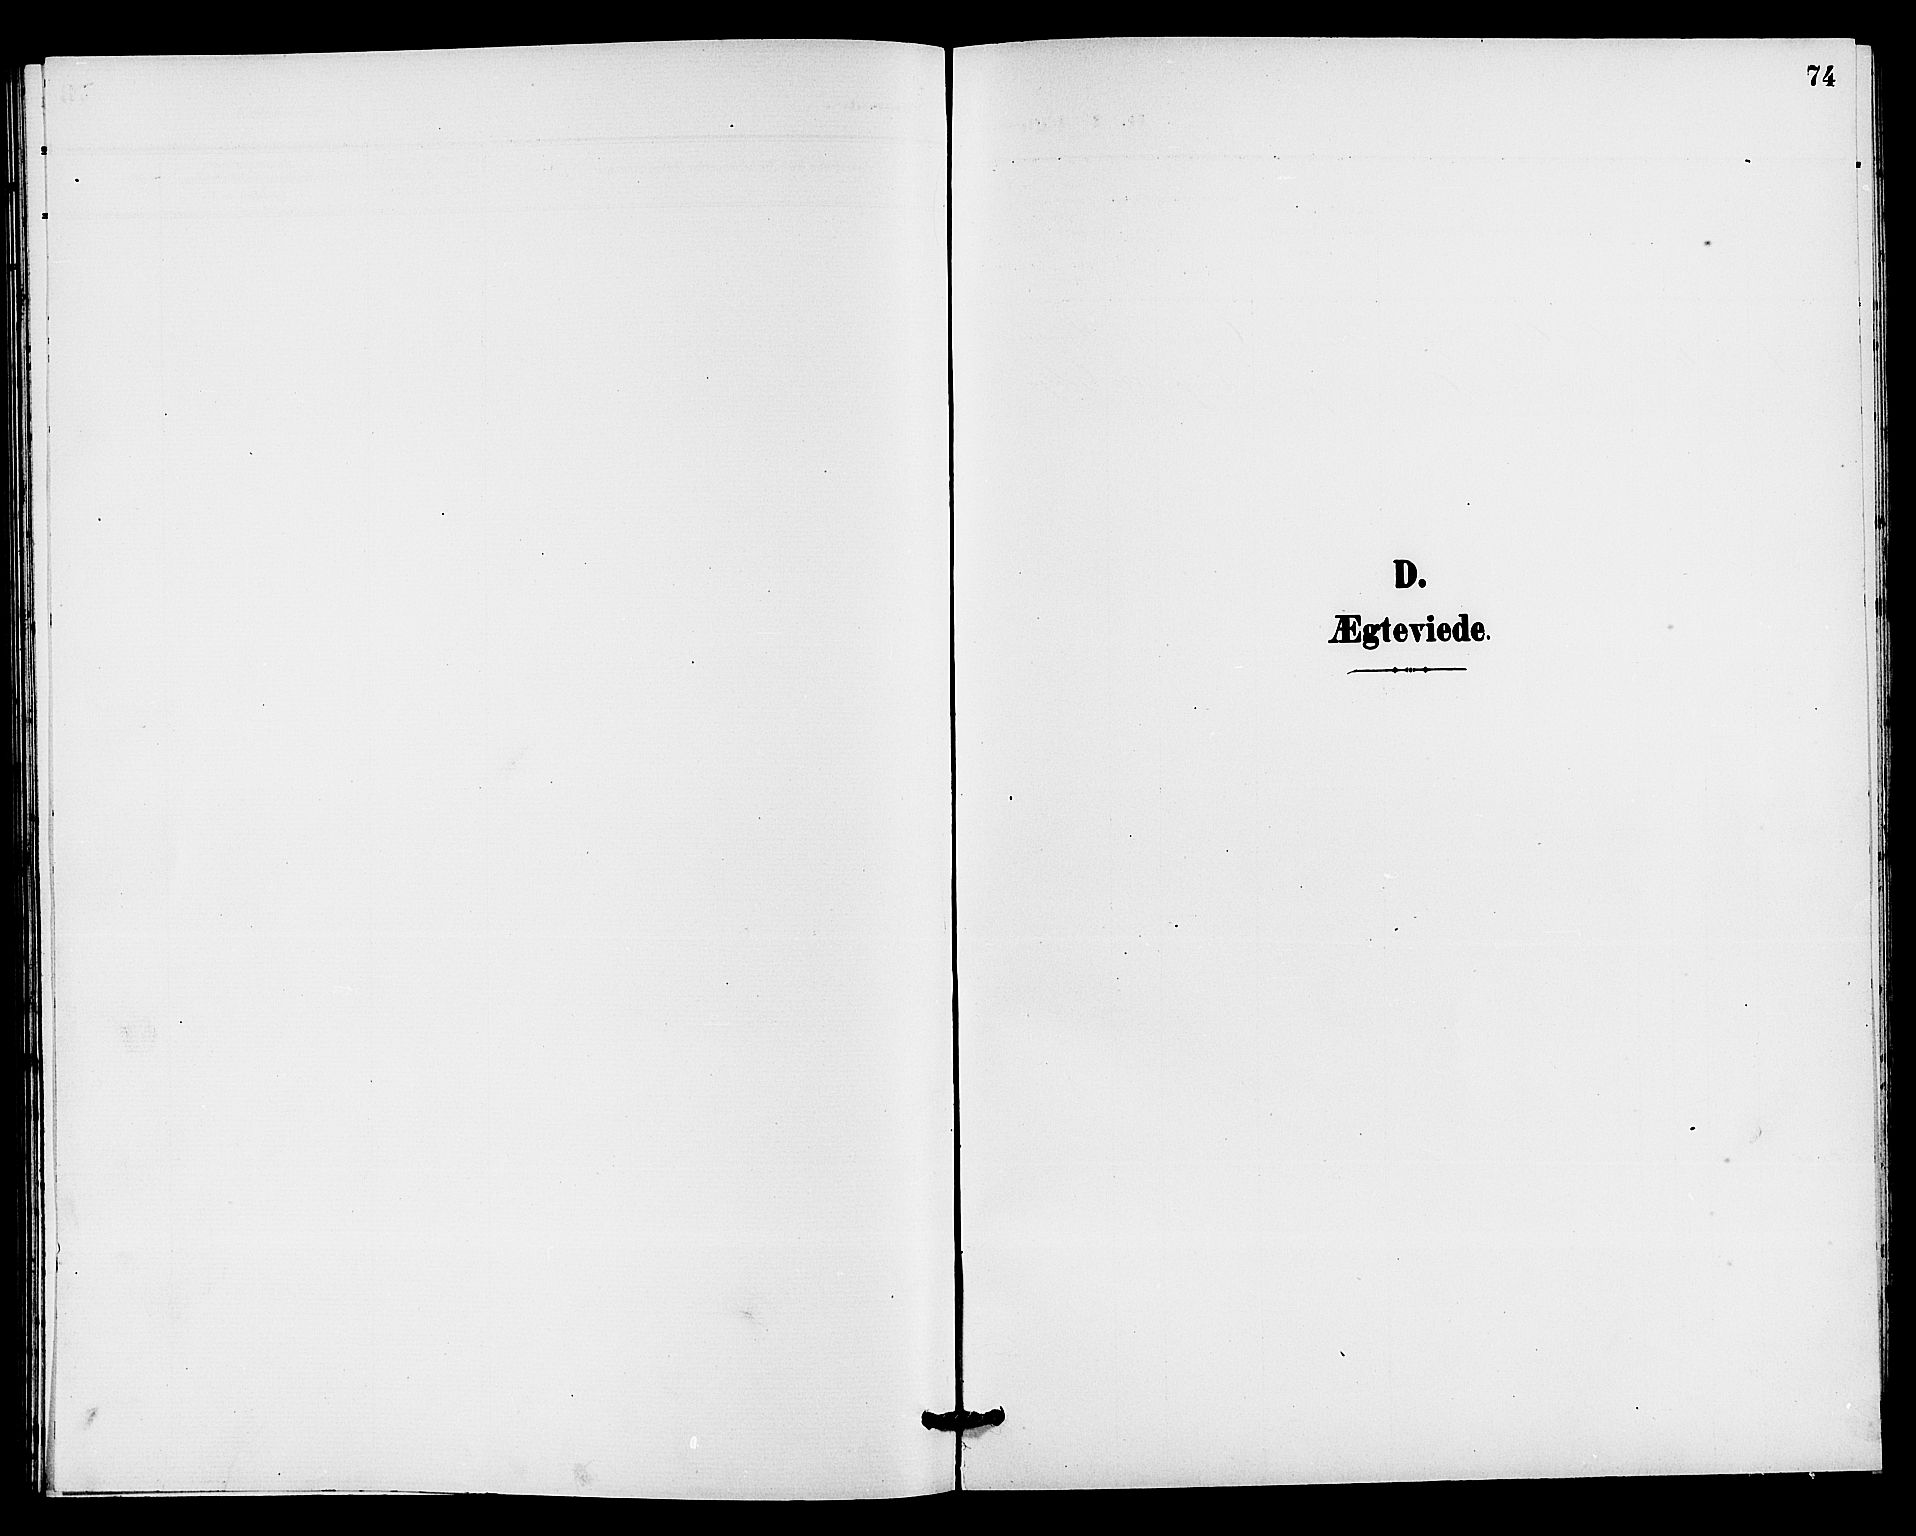 SAKO, Holla kirkebøker, G/Gb/L0002: Klokkerbok nr. II 2, 1897-1913, s. 74